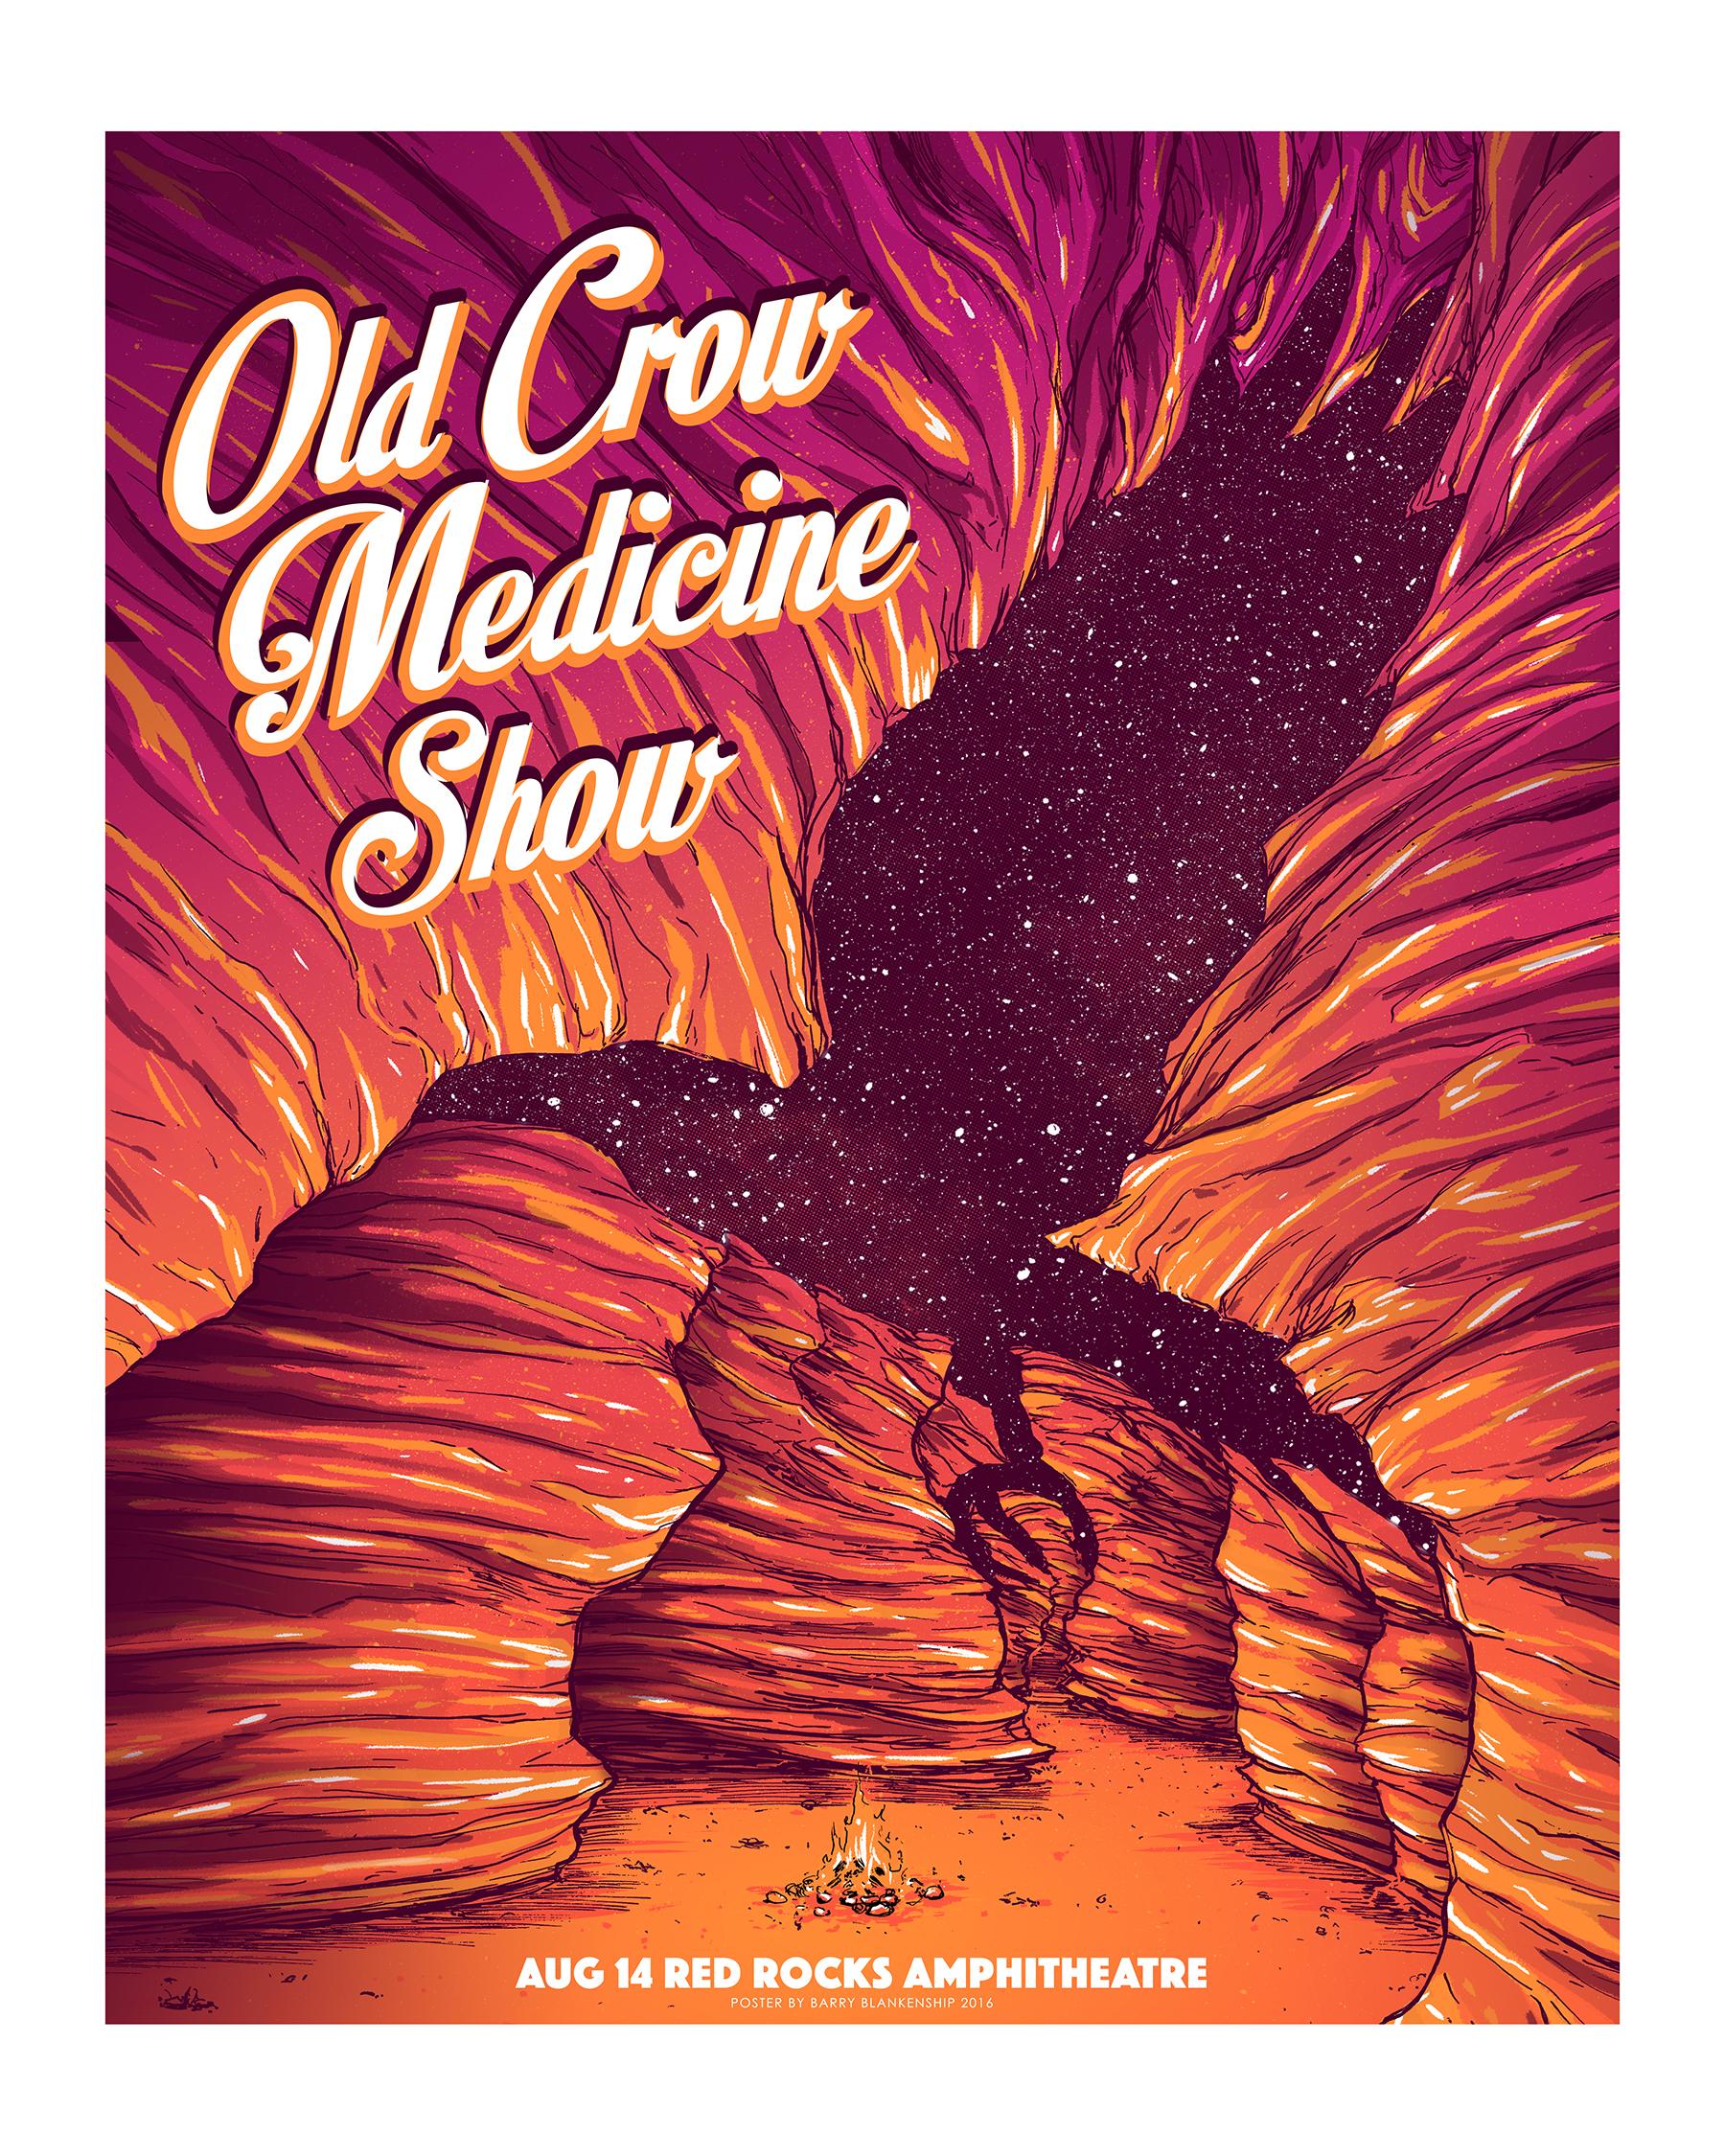 old_crow_red_rocks_aug_14.jpg